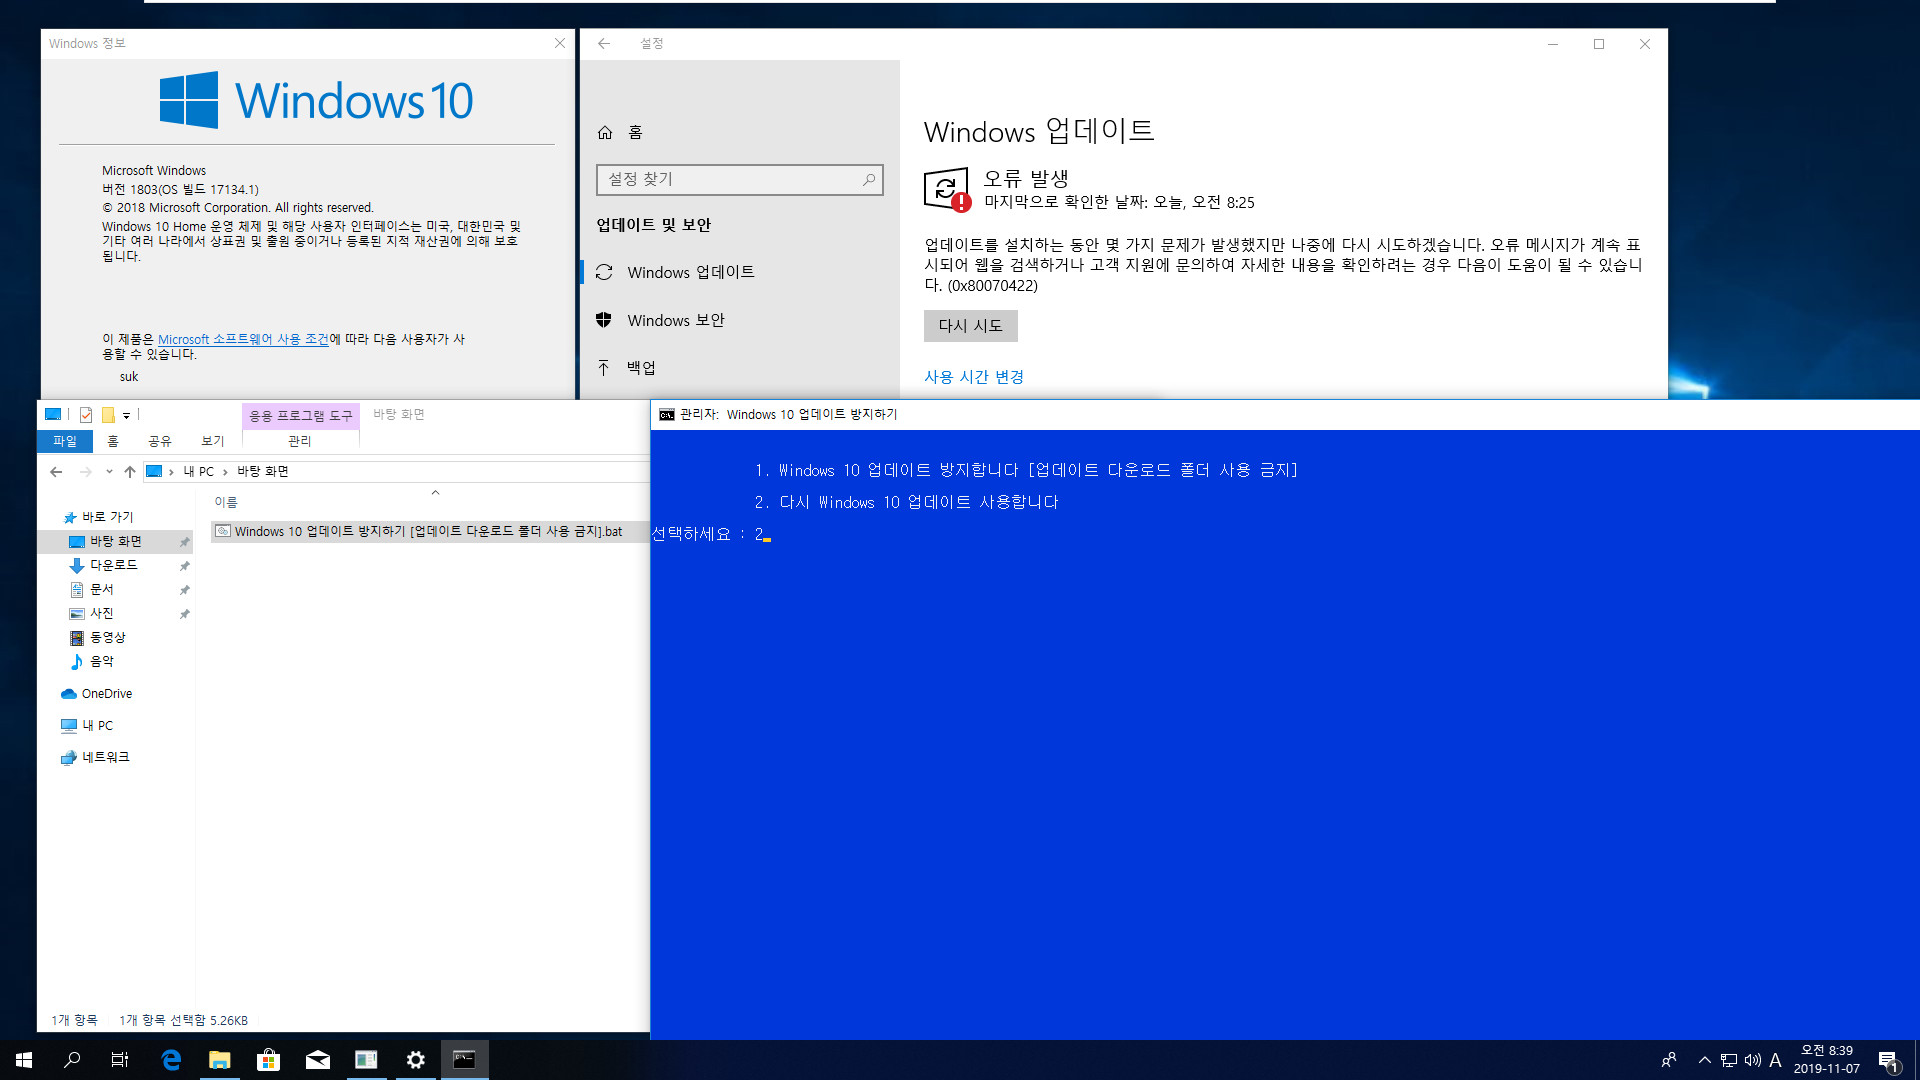 Windows 10 업데이트 방지하기 [업데이트 다운로드 폴더 사용 금지].bat 테스트 - 버전 1803, Home 에서 버전 1903 기능 업데이트 방지하기 2019-11-07_083913.jpg